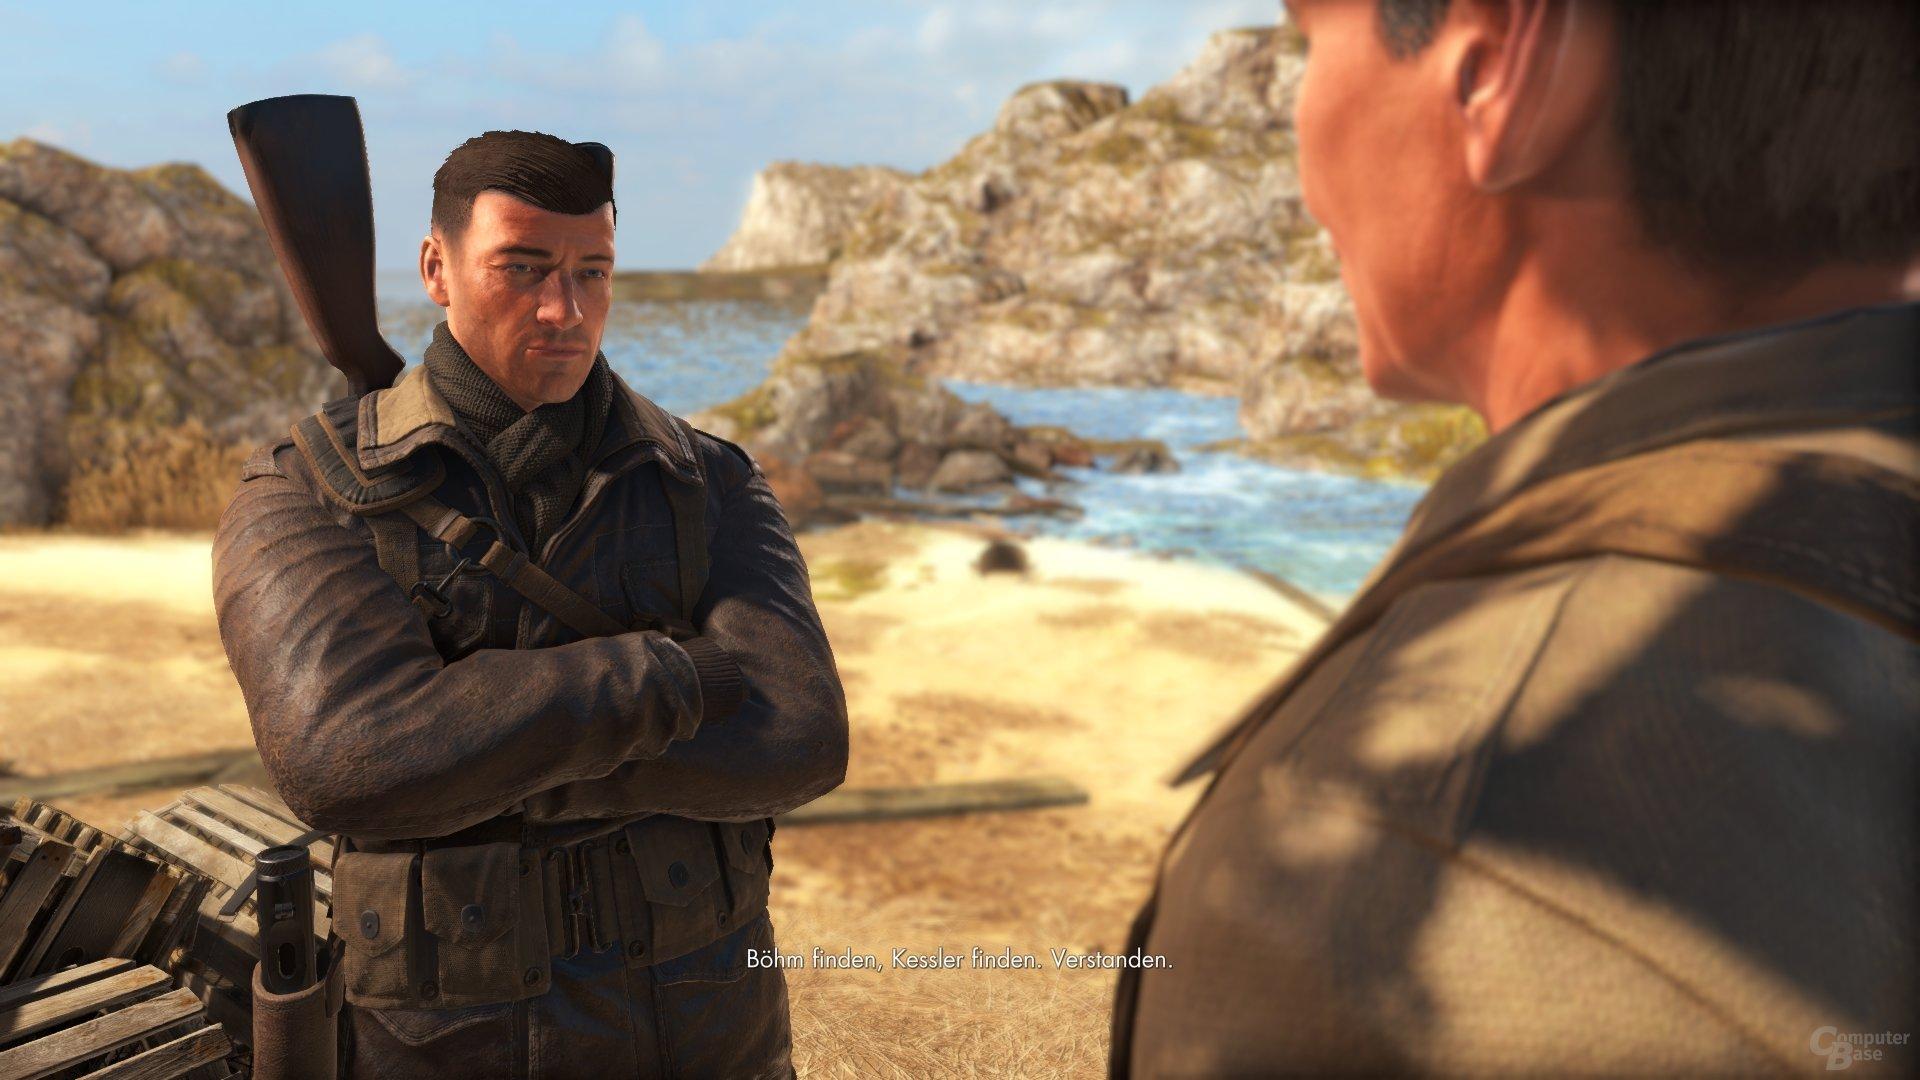 Sniper-Protagonist Fairburne